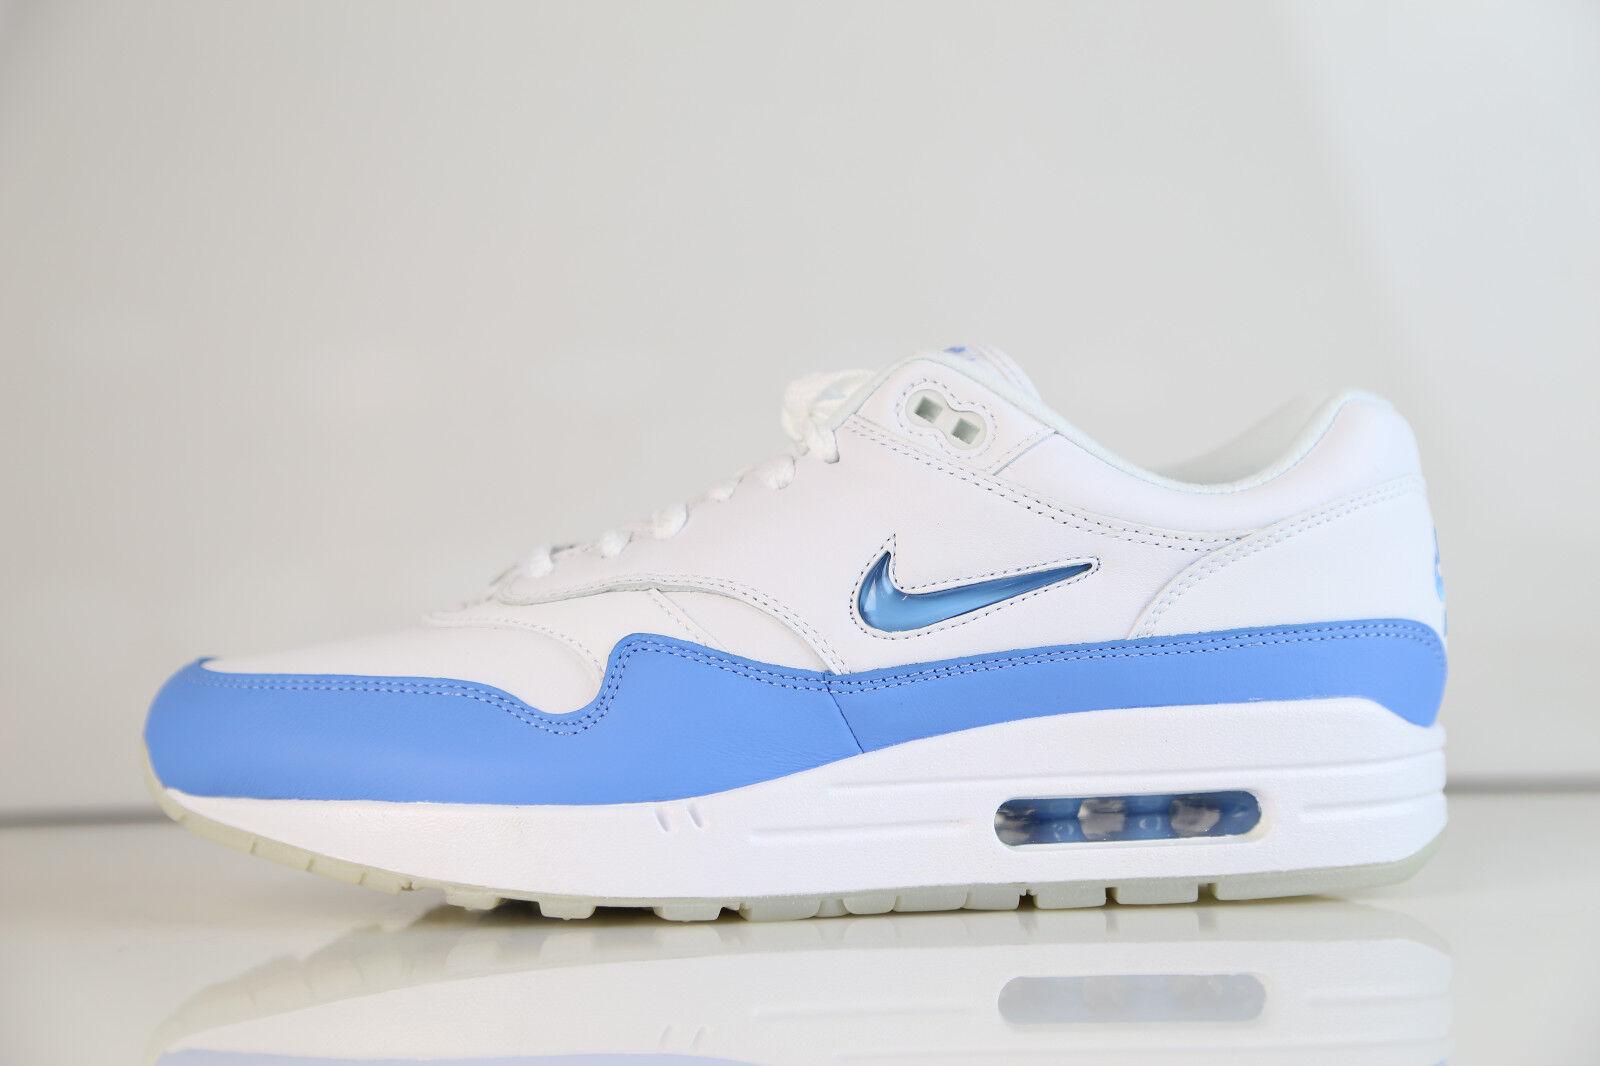 Nike Air Max 1 Premium SC Jewel White University Blue 918354-102 8-13 prm 90